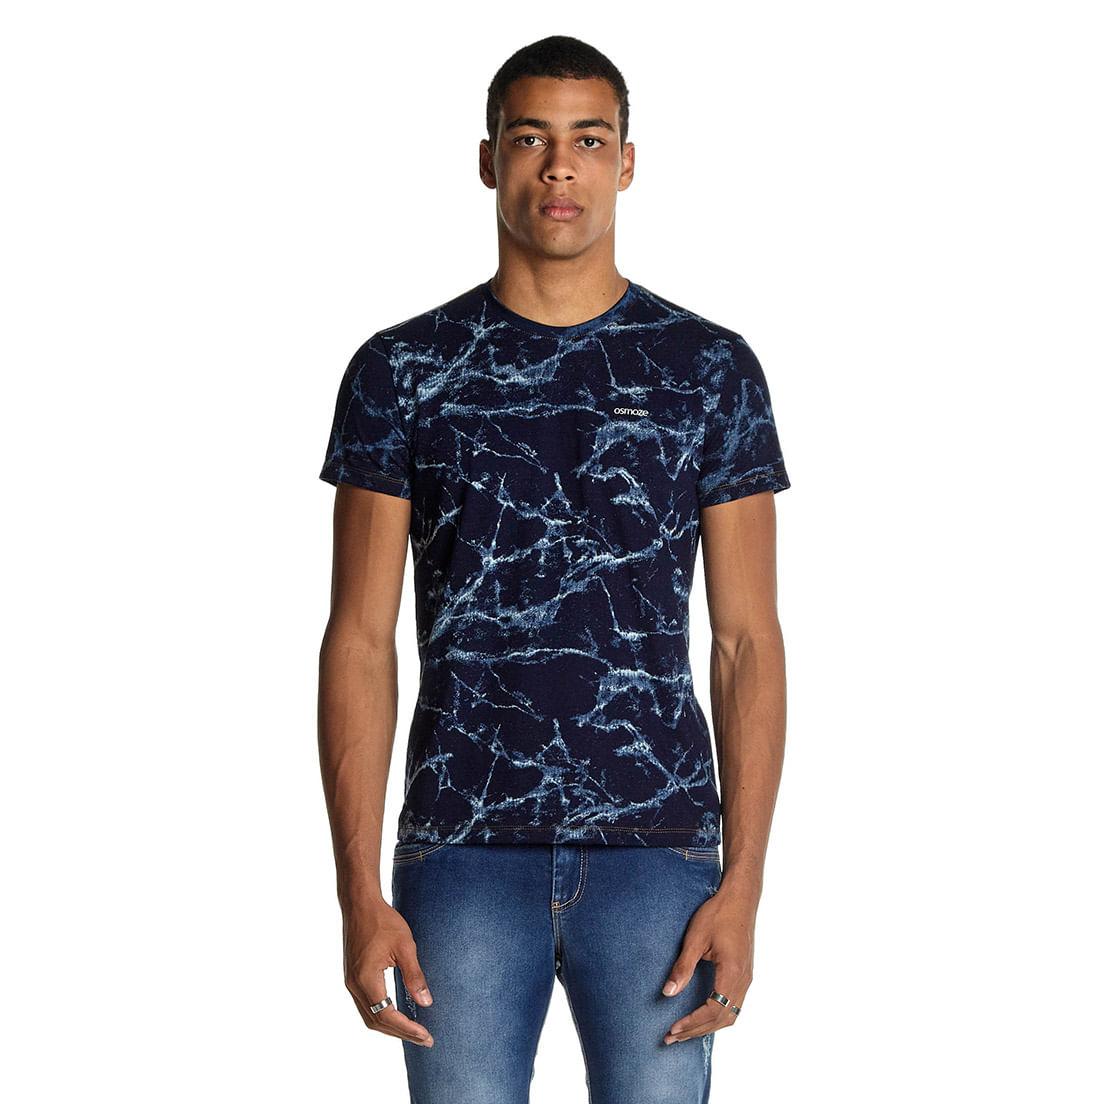 Camiseta Osmoze Tie Dye Espaço Sideral 110112870 Azul